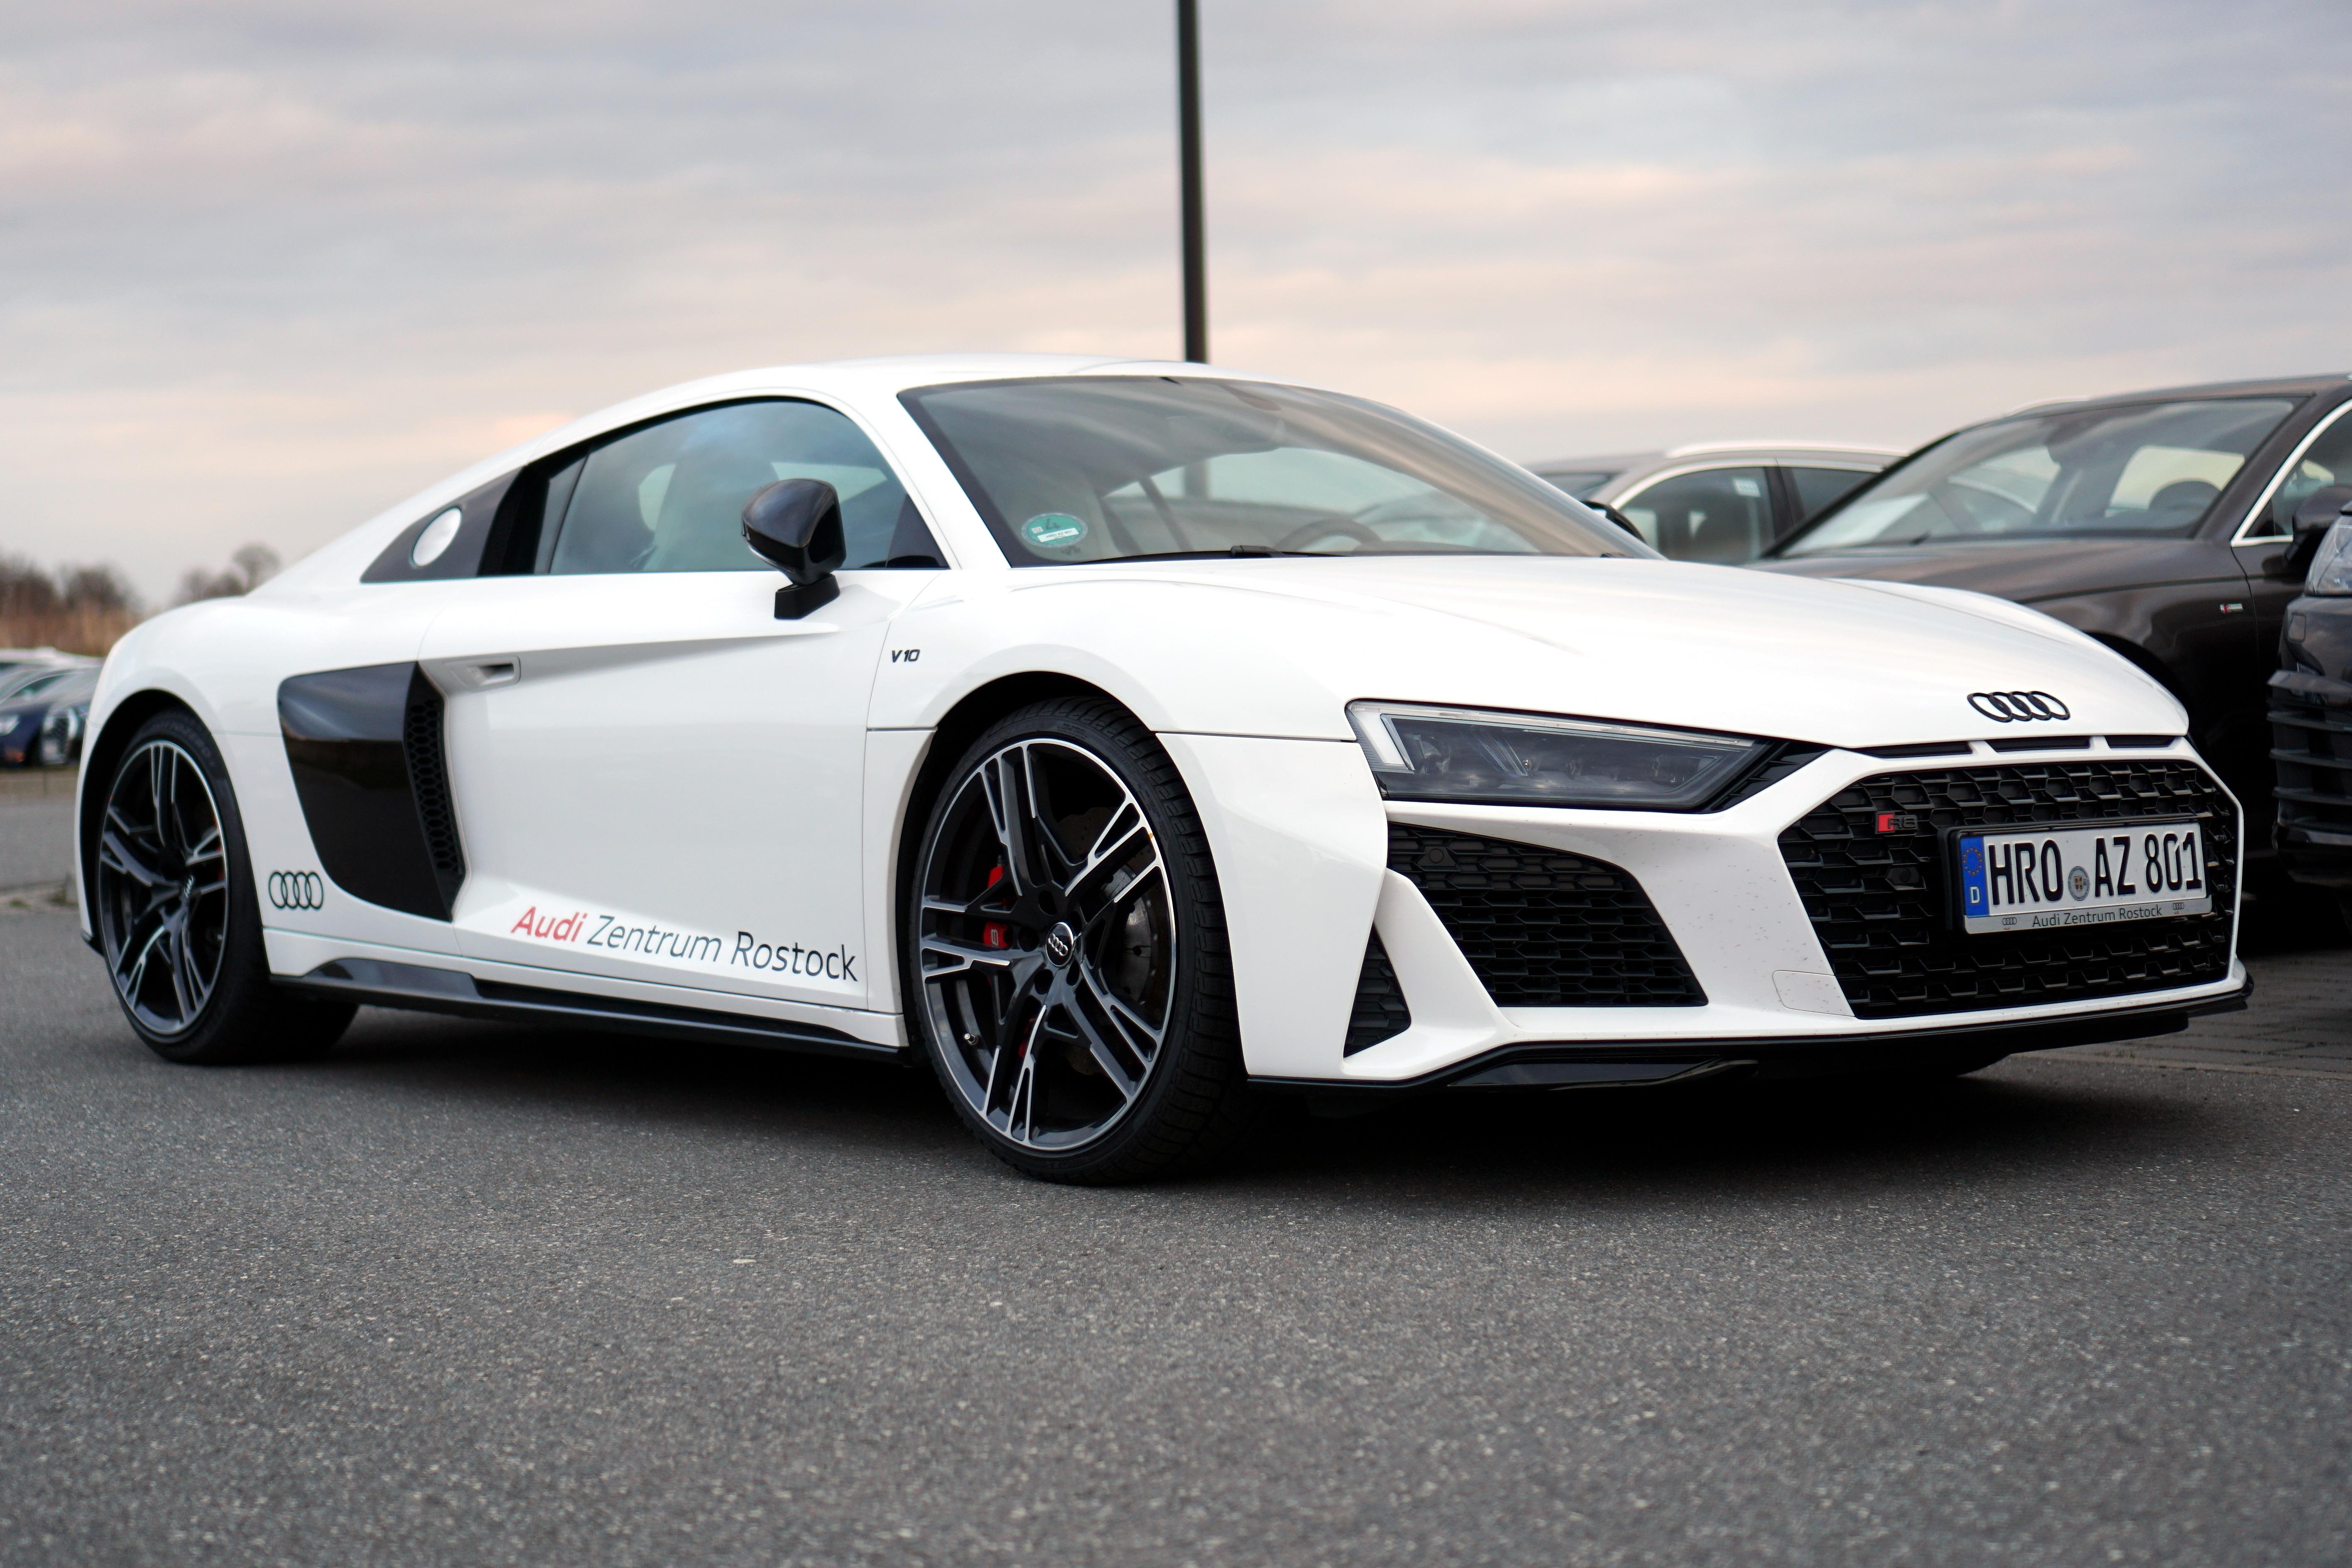 Kelebihan Kekurangan Audi T8 Murah Berkualitas